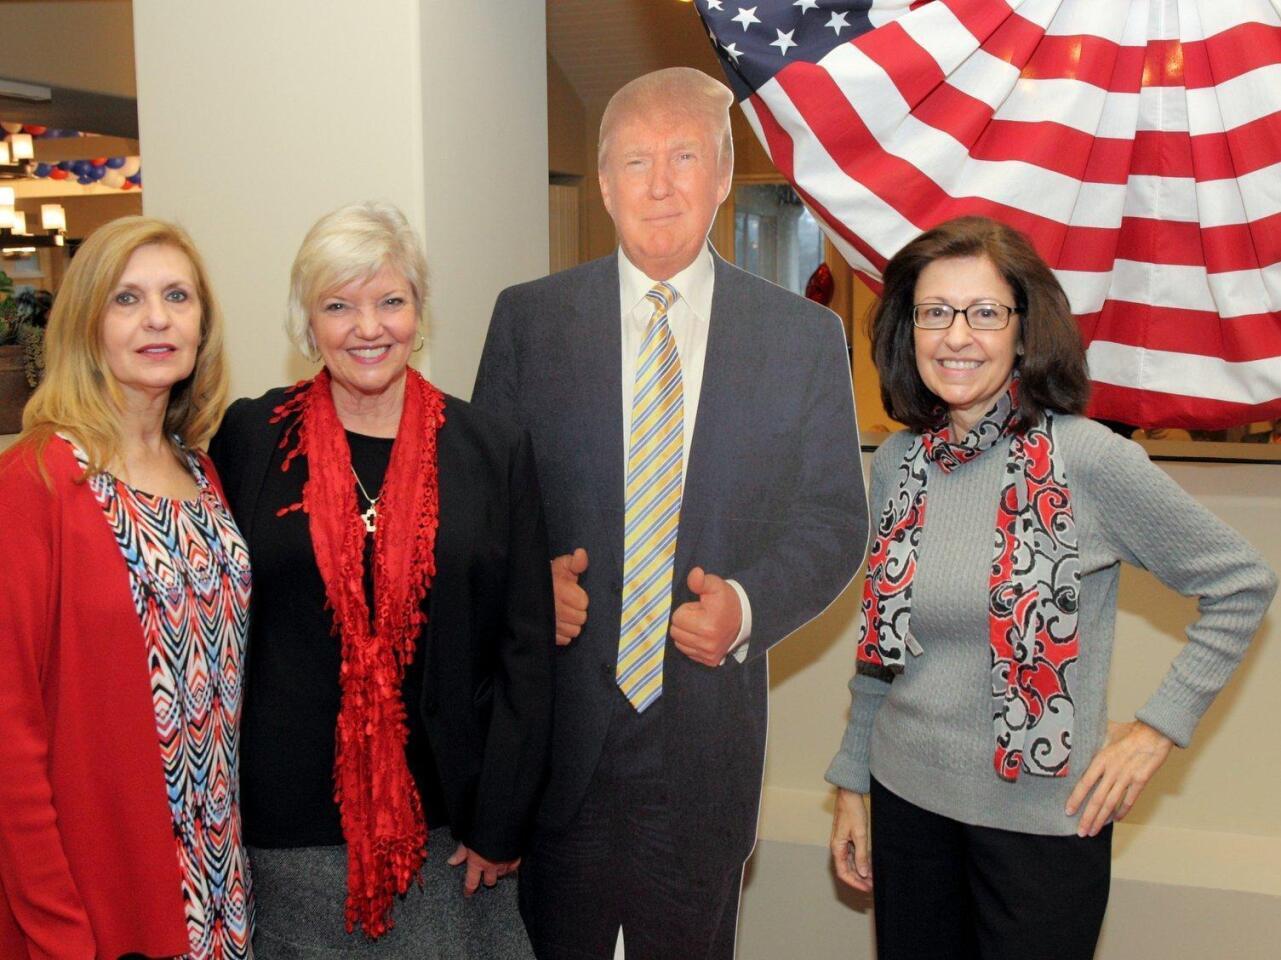 GOP toasts Trump inauguration in Fairbanks Ranch